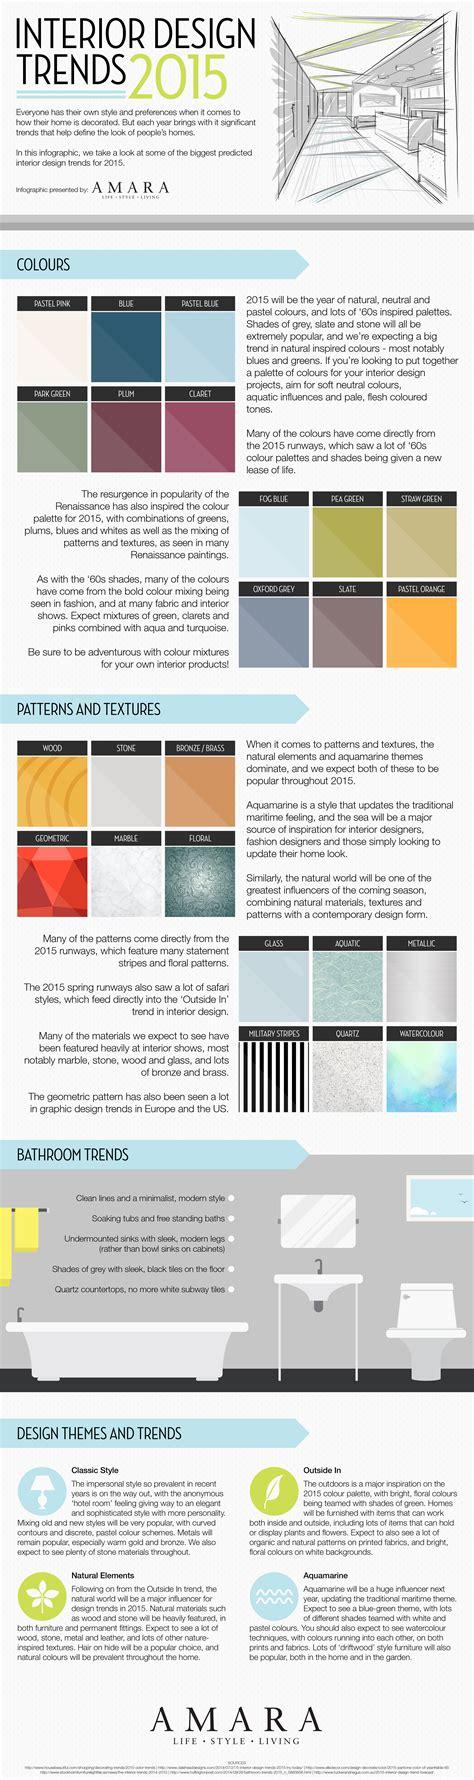 interieur trends 2015 interior design trends 2015